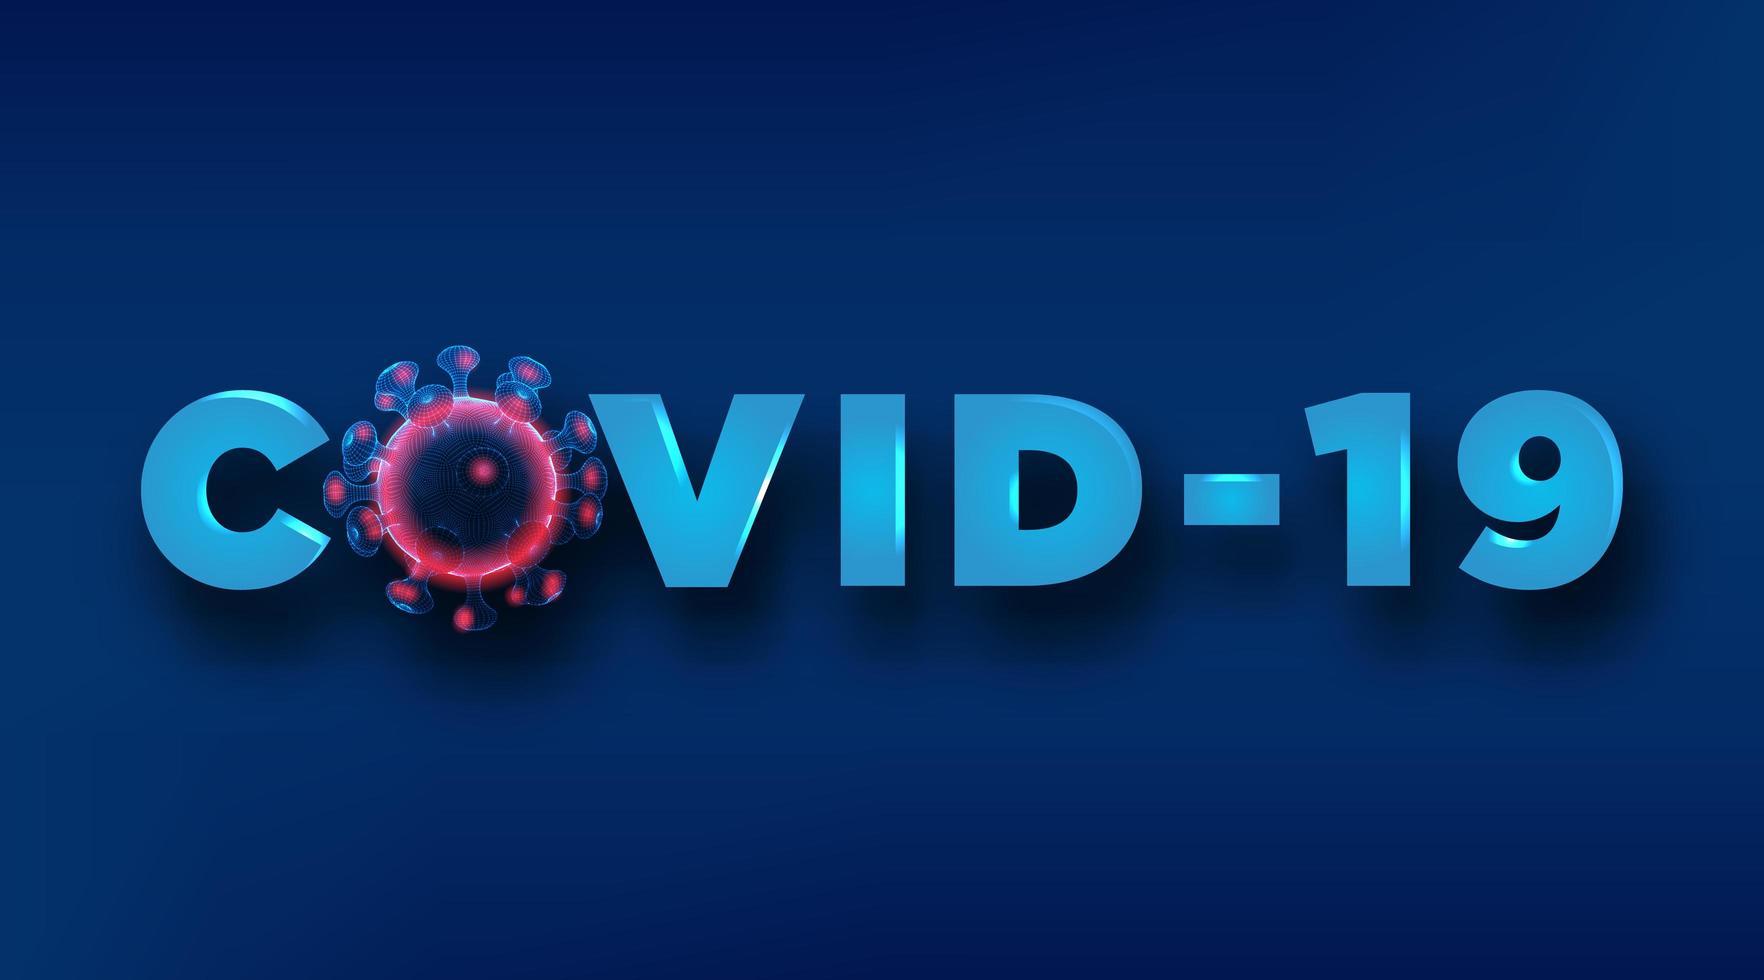 covid-19-Text mit Wireframe-Viruszelle vektor